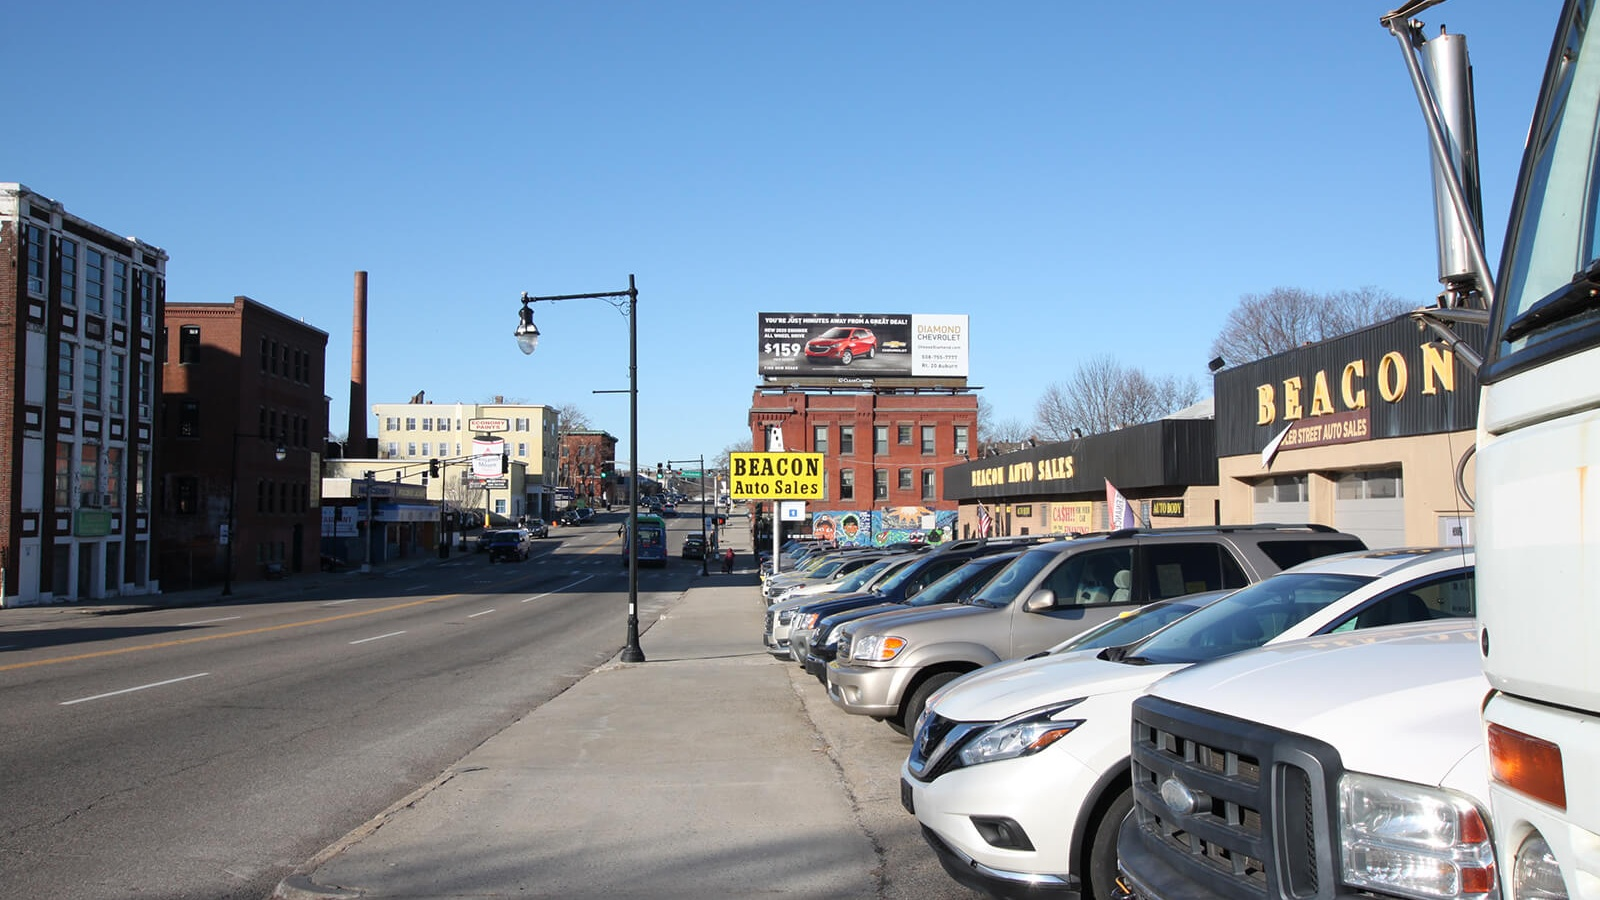 127 Chandler Street, Worcester, Massachusetts 01609, Retail / Restaurant,For Sale,Chandler Street,1241